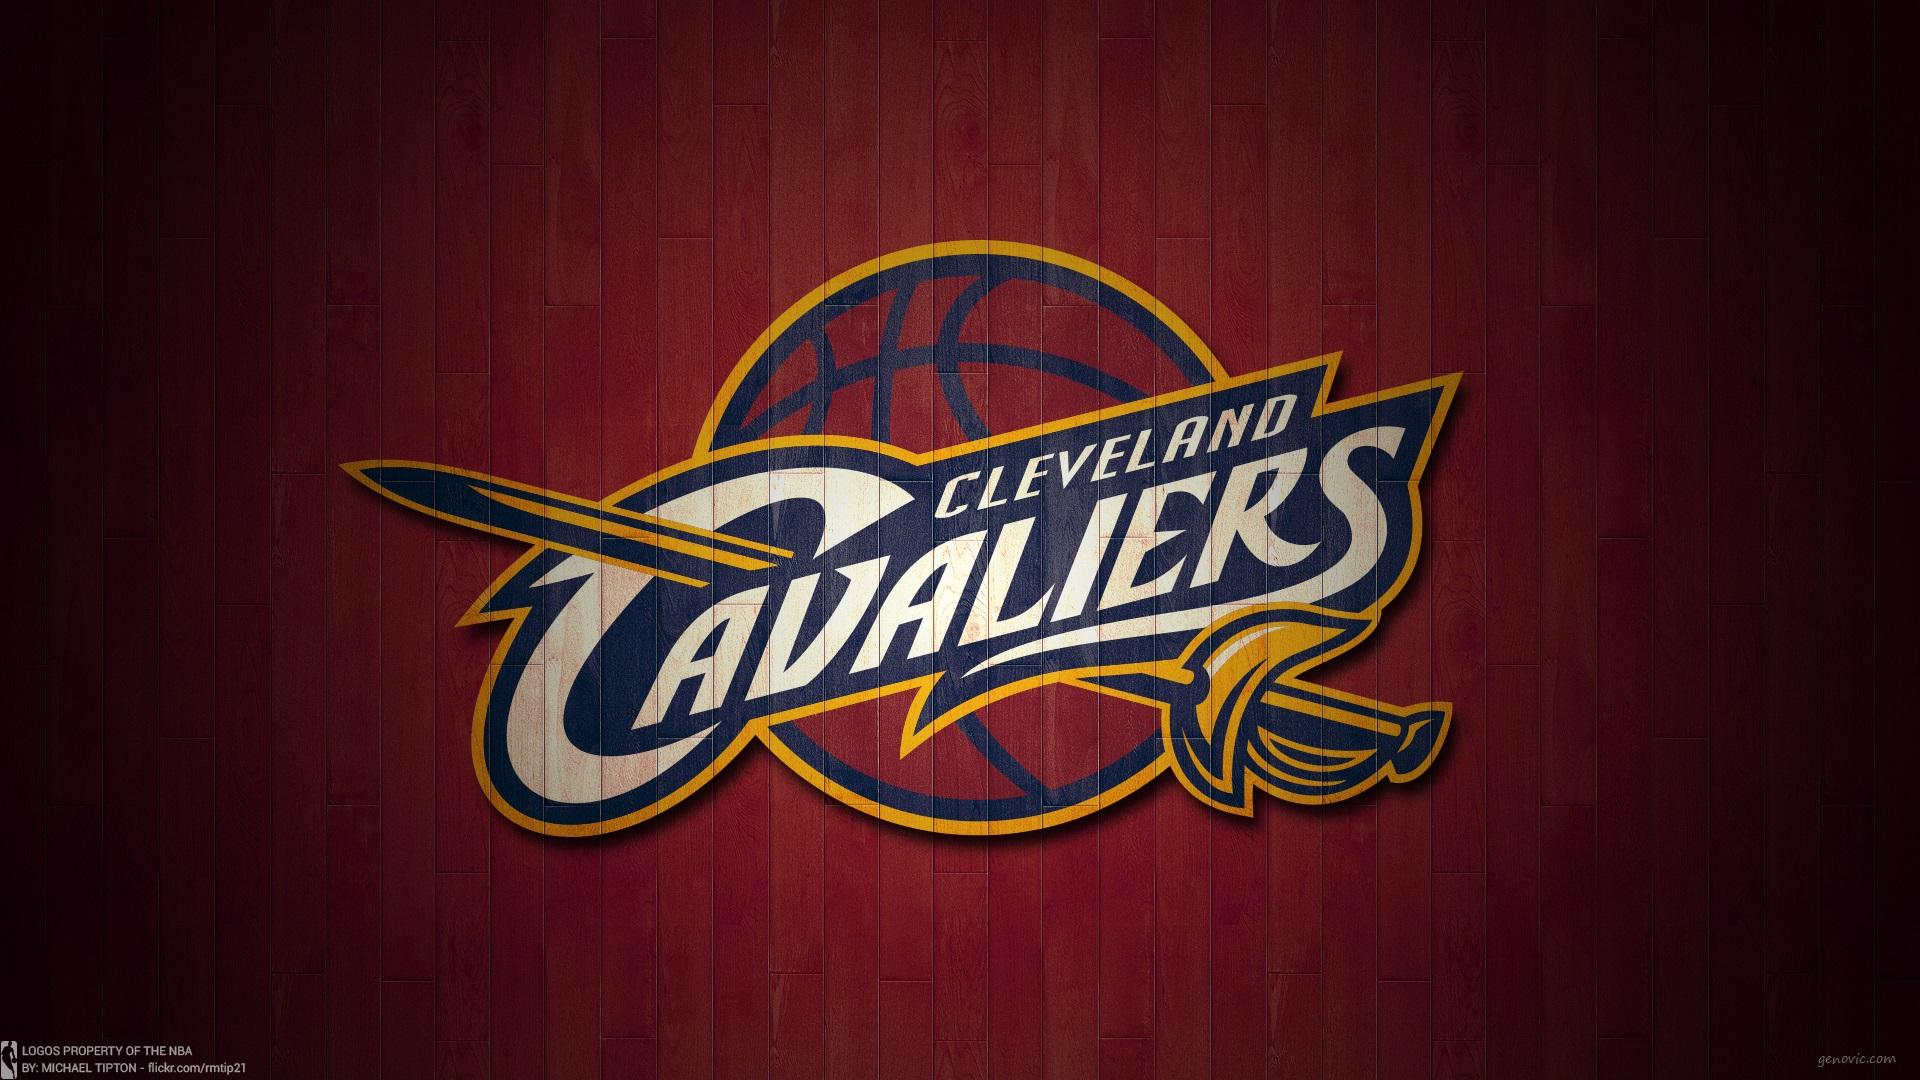 NBA: Cav hizo múltiples ofertas antes de que expirara el plazo del intercambio